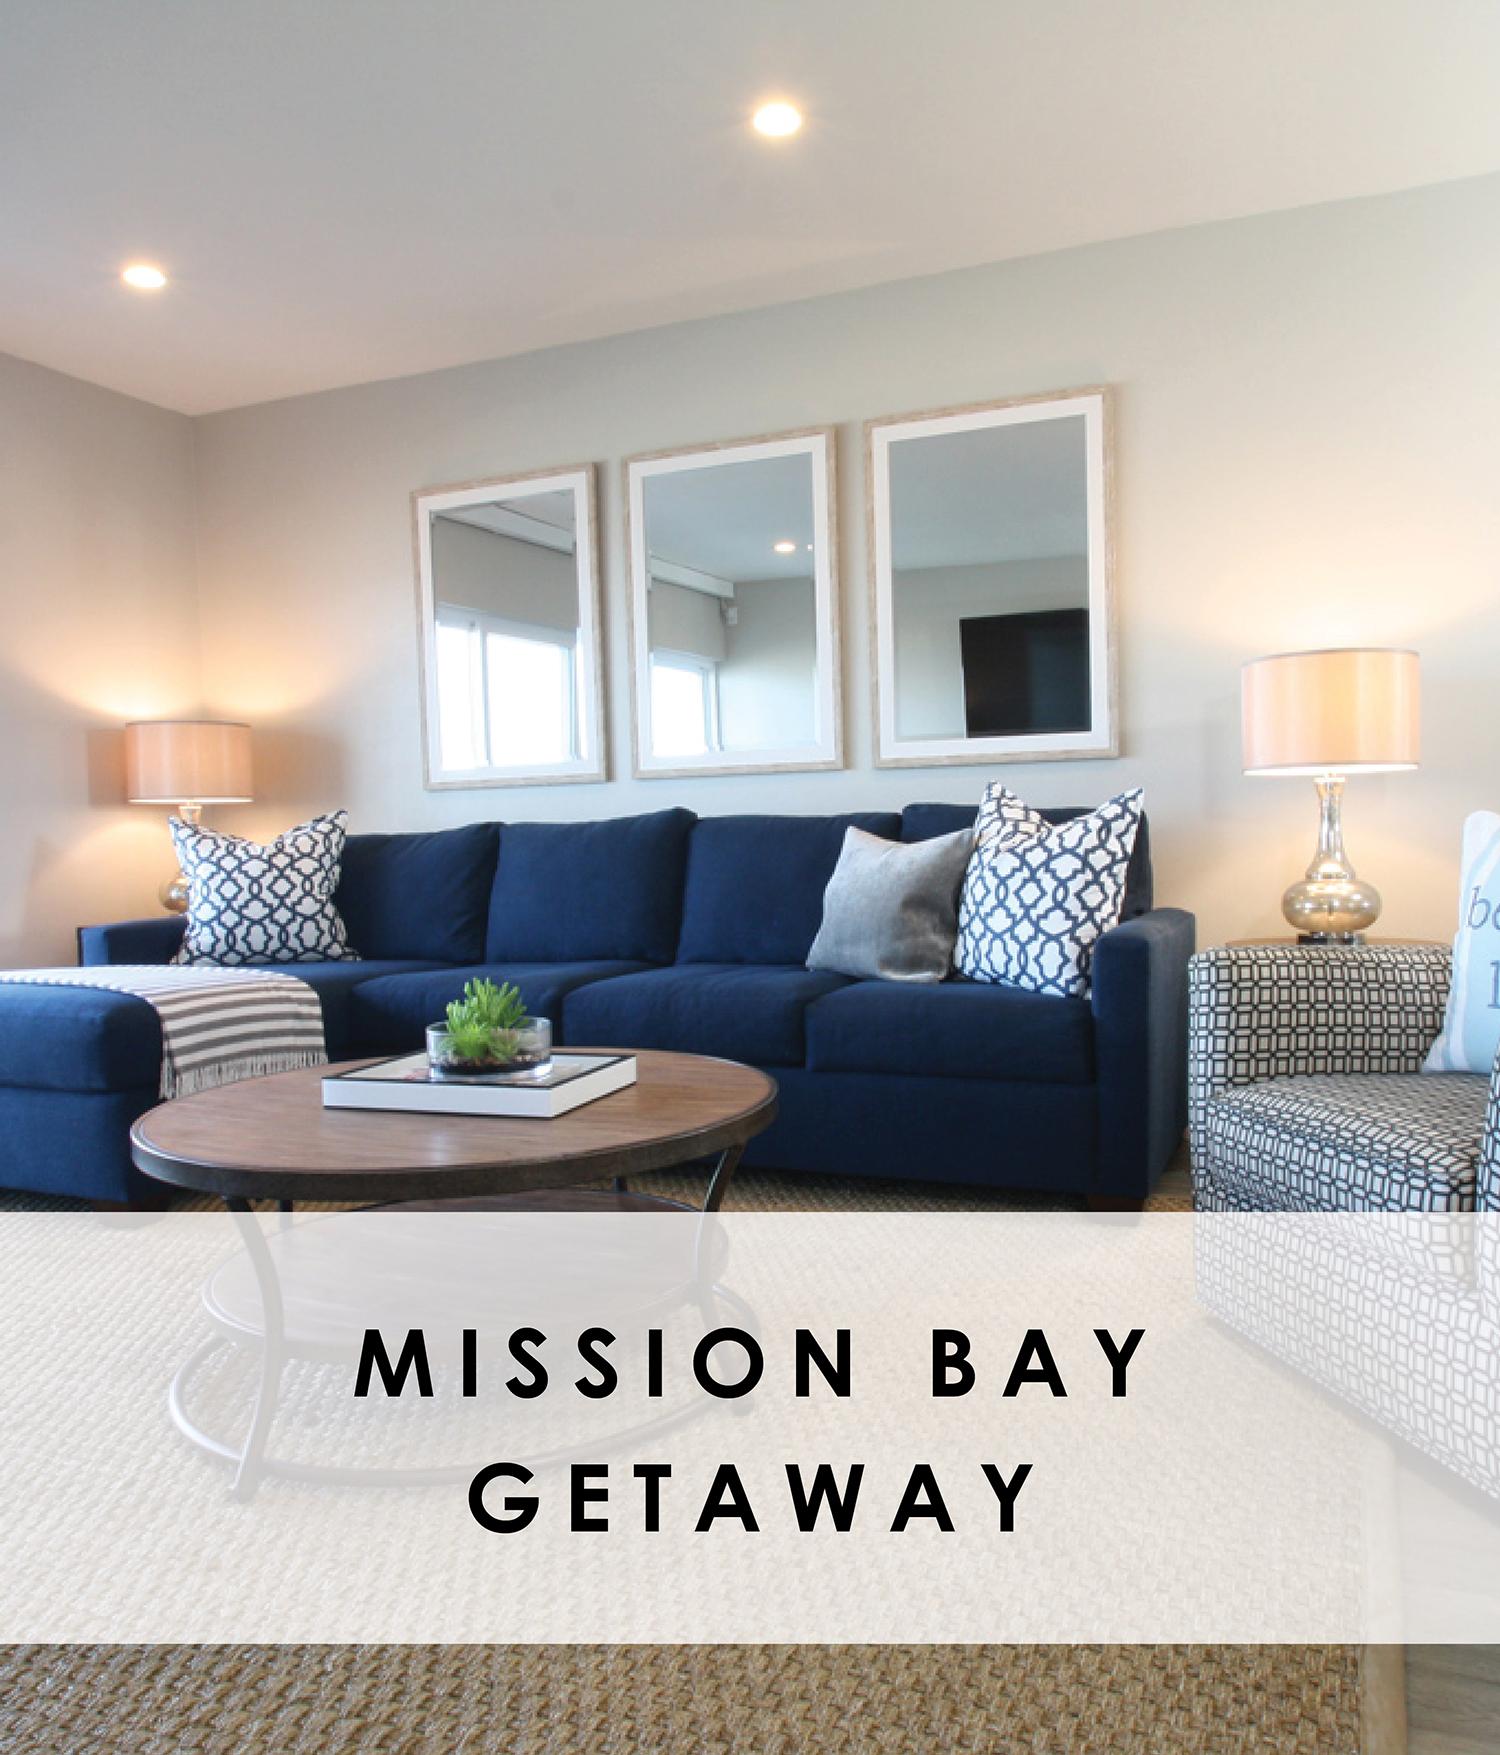 Mission Bay Getaway_MBV.jpg